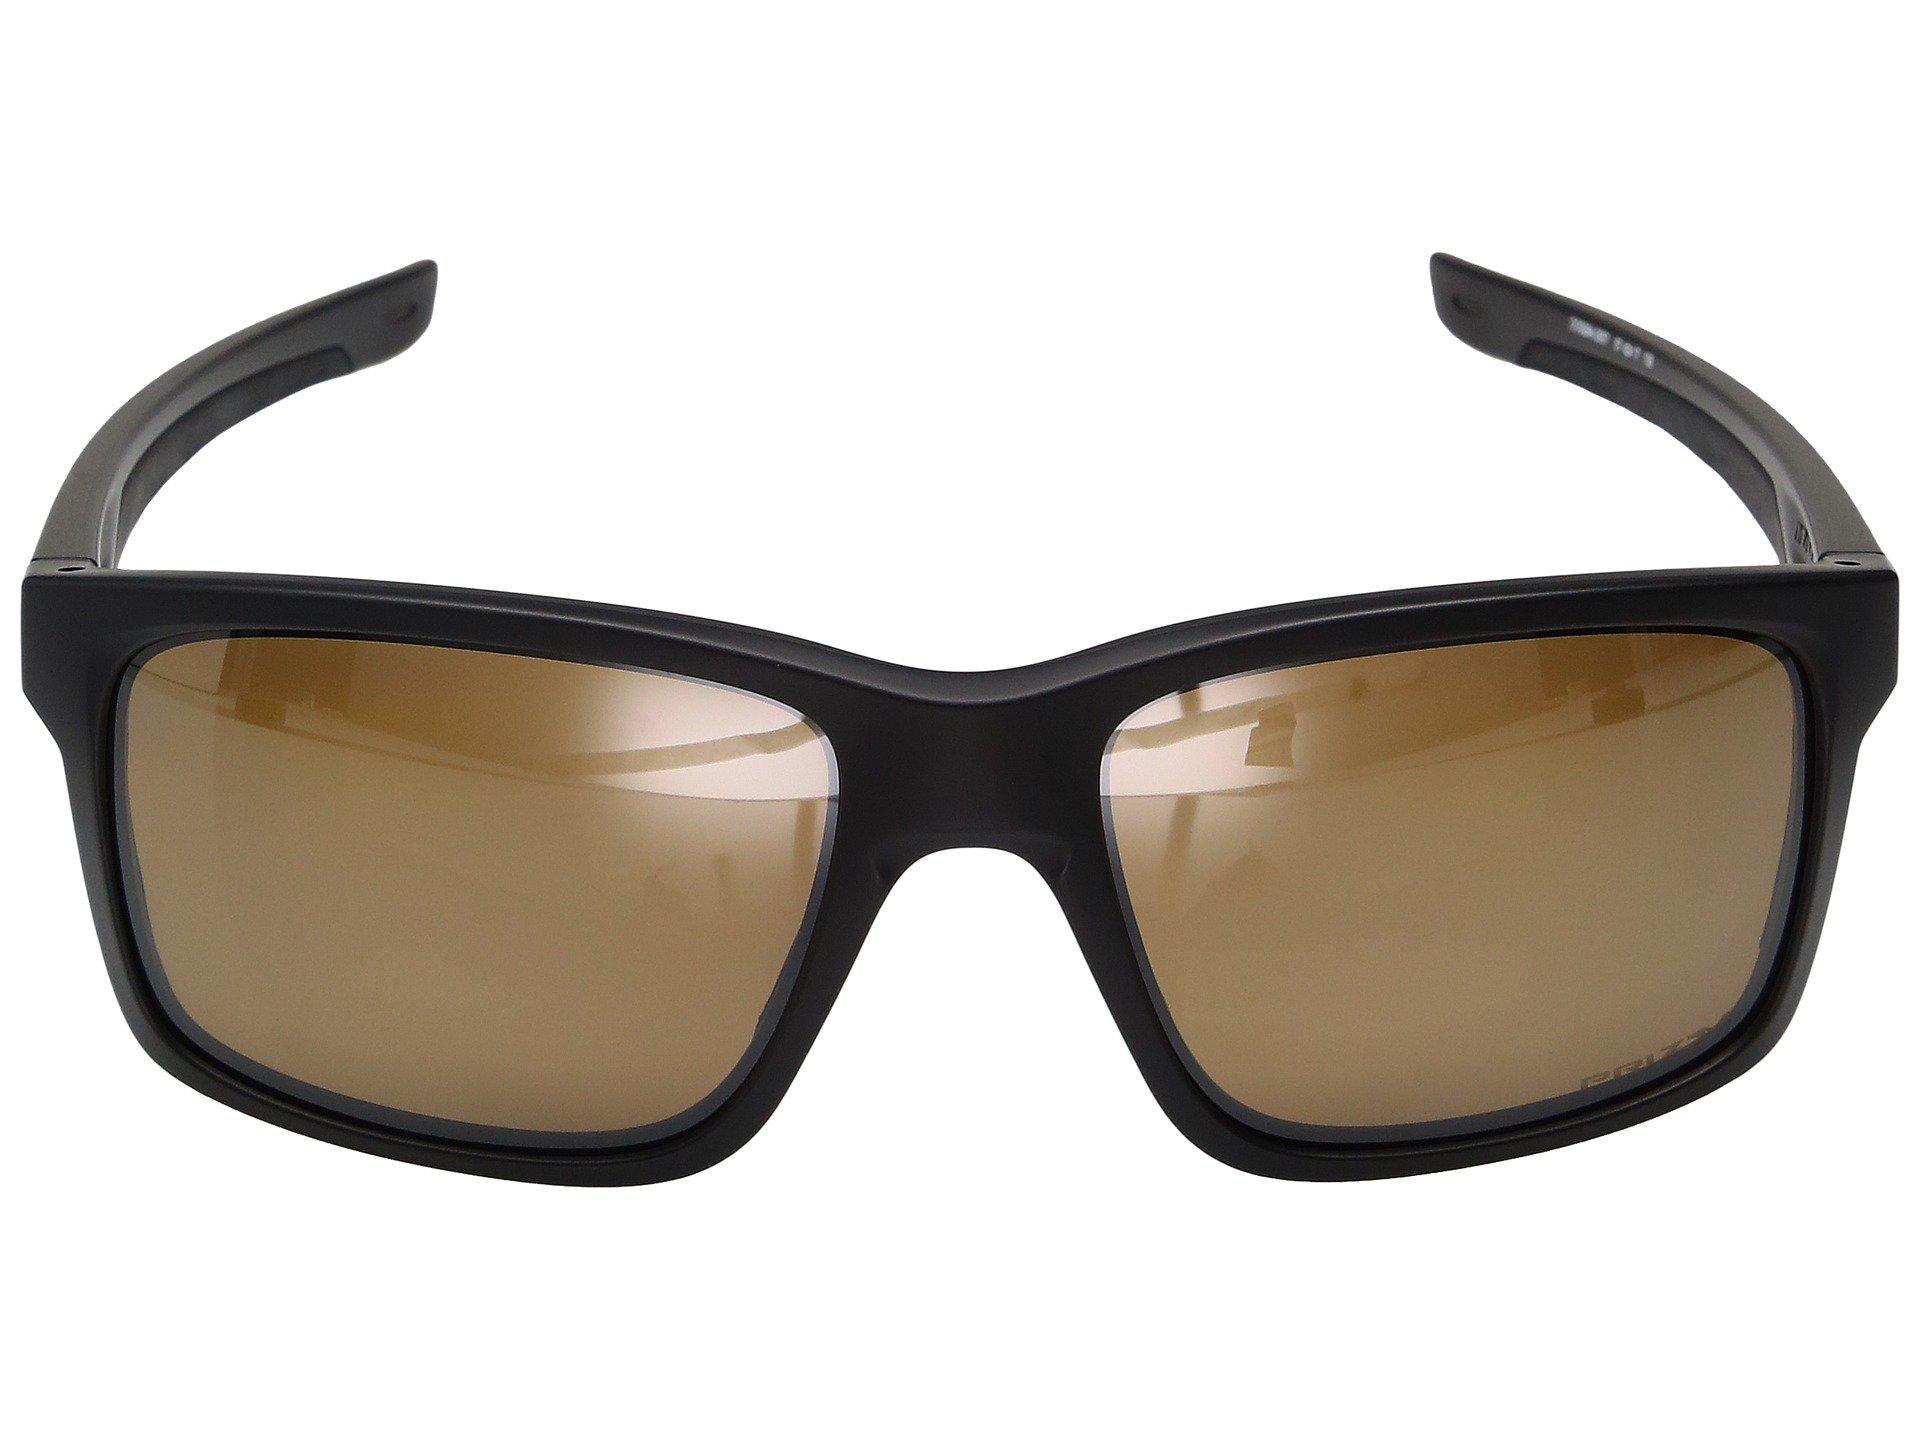 3a87981766f Oakley - Mainlink (matte Black W  Prizm Tungsten Polarized) Fashion  Sunglasses for Men. View fullscreen